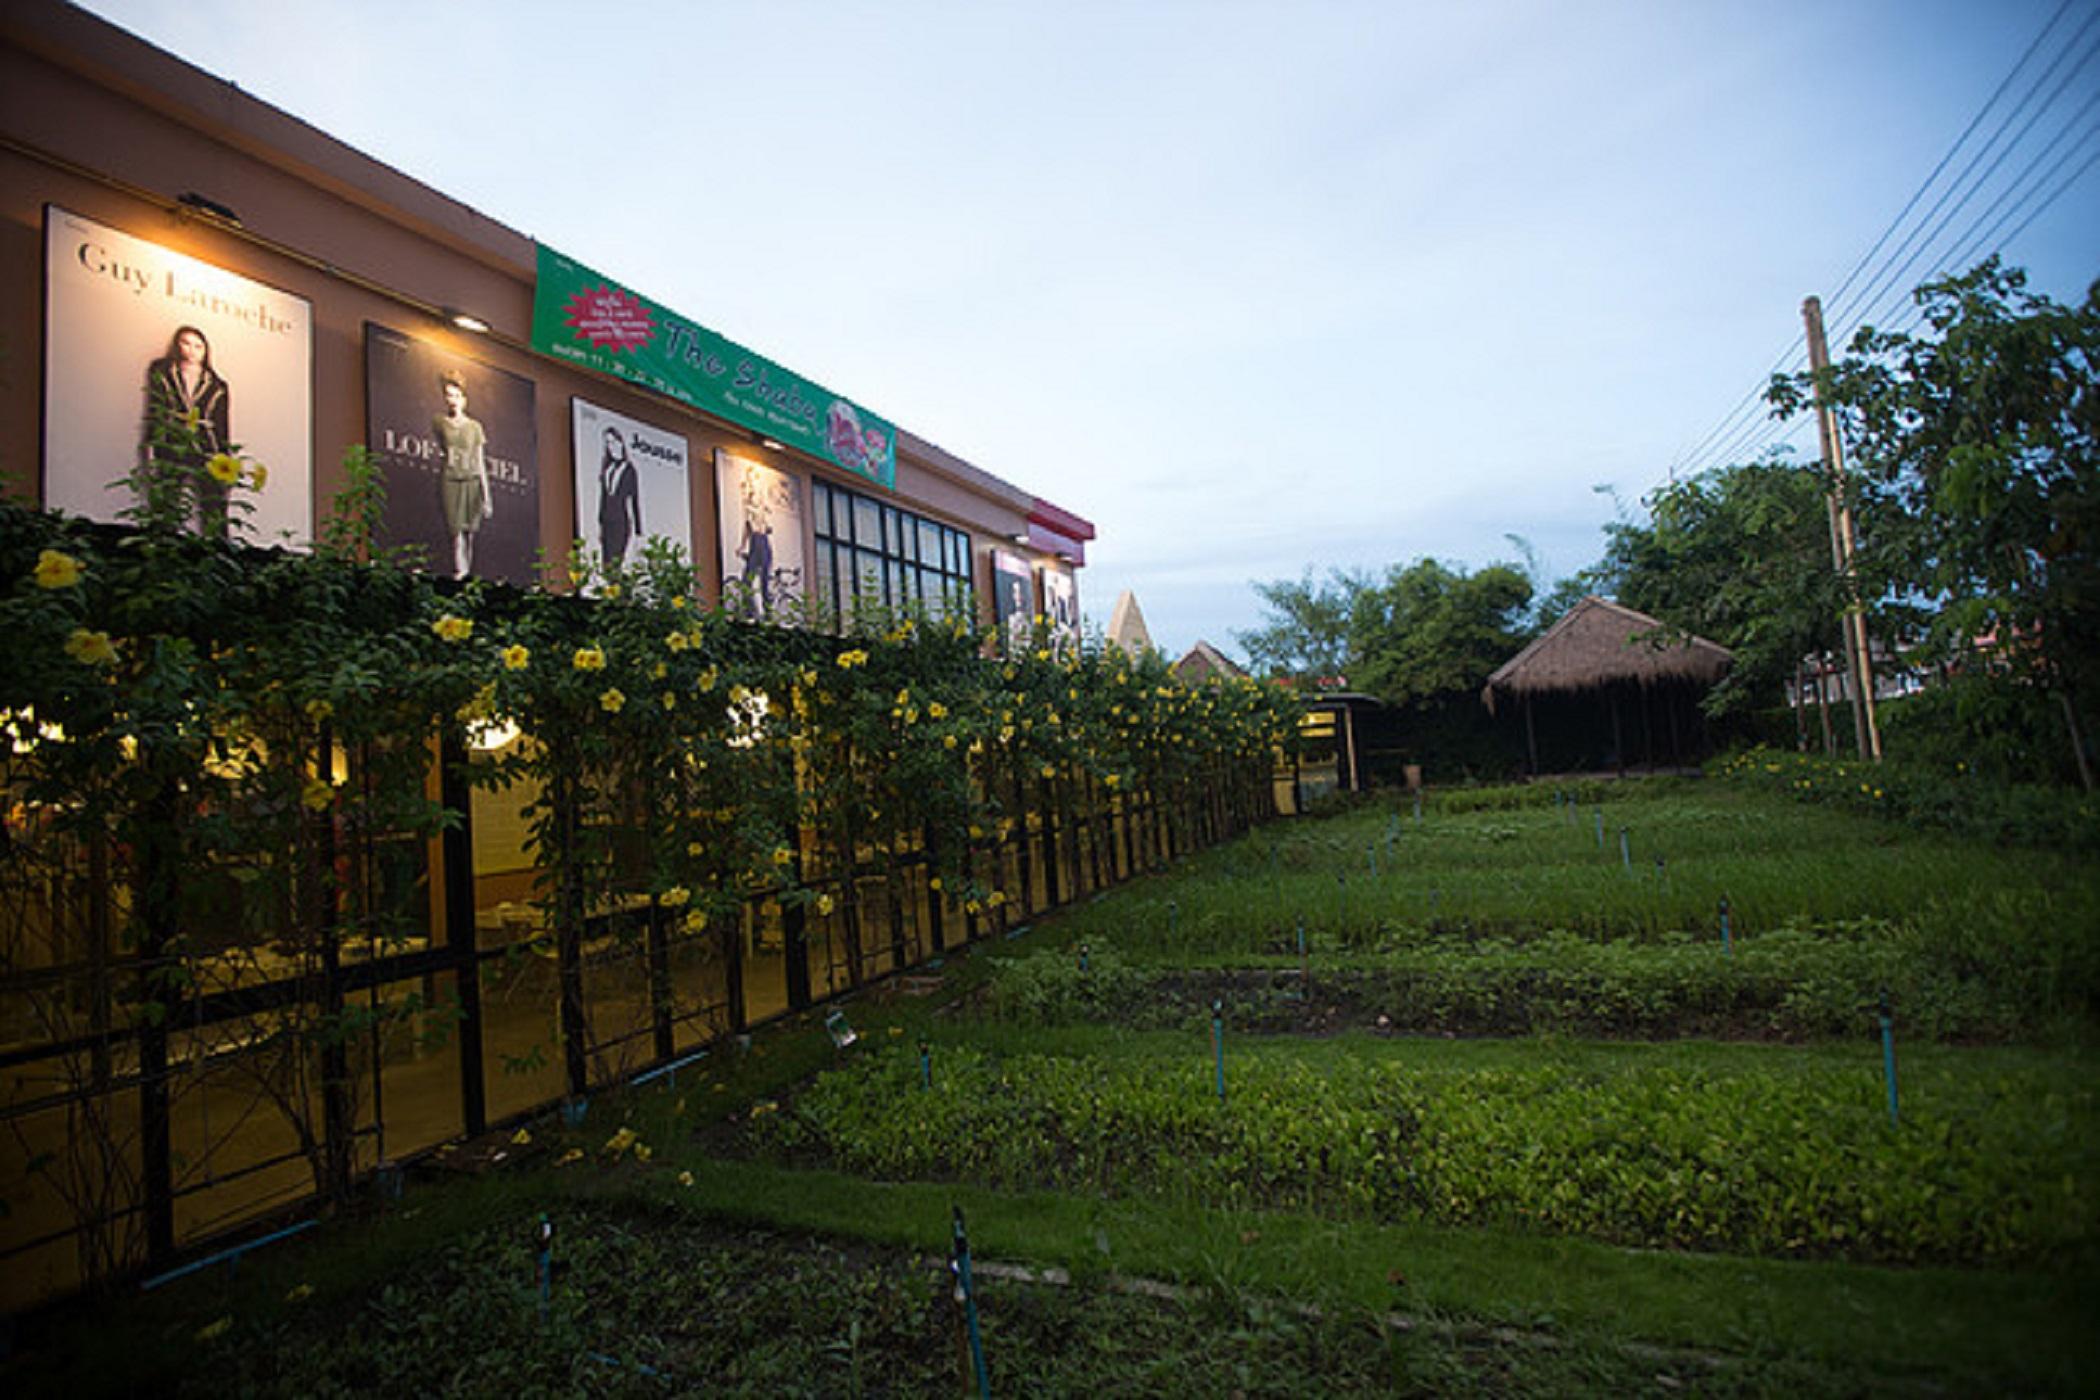 Siam Villa Suites Suvarnabhumi, Lat Krabang